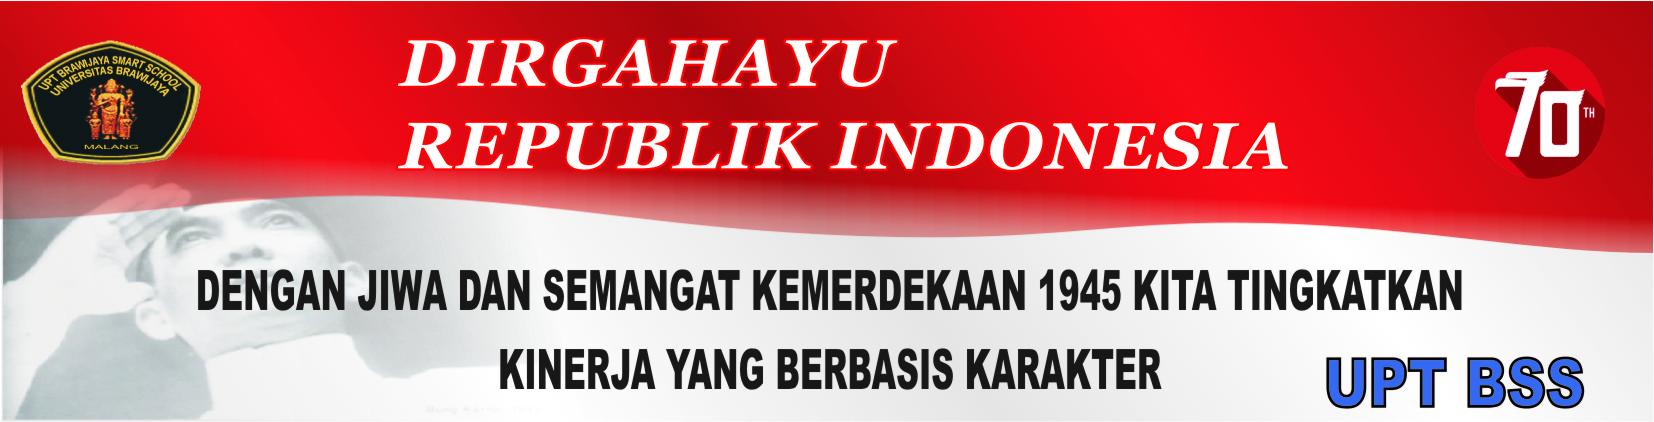 DIRGAHAYU INDONESIA 70